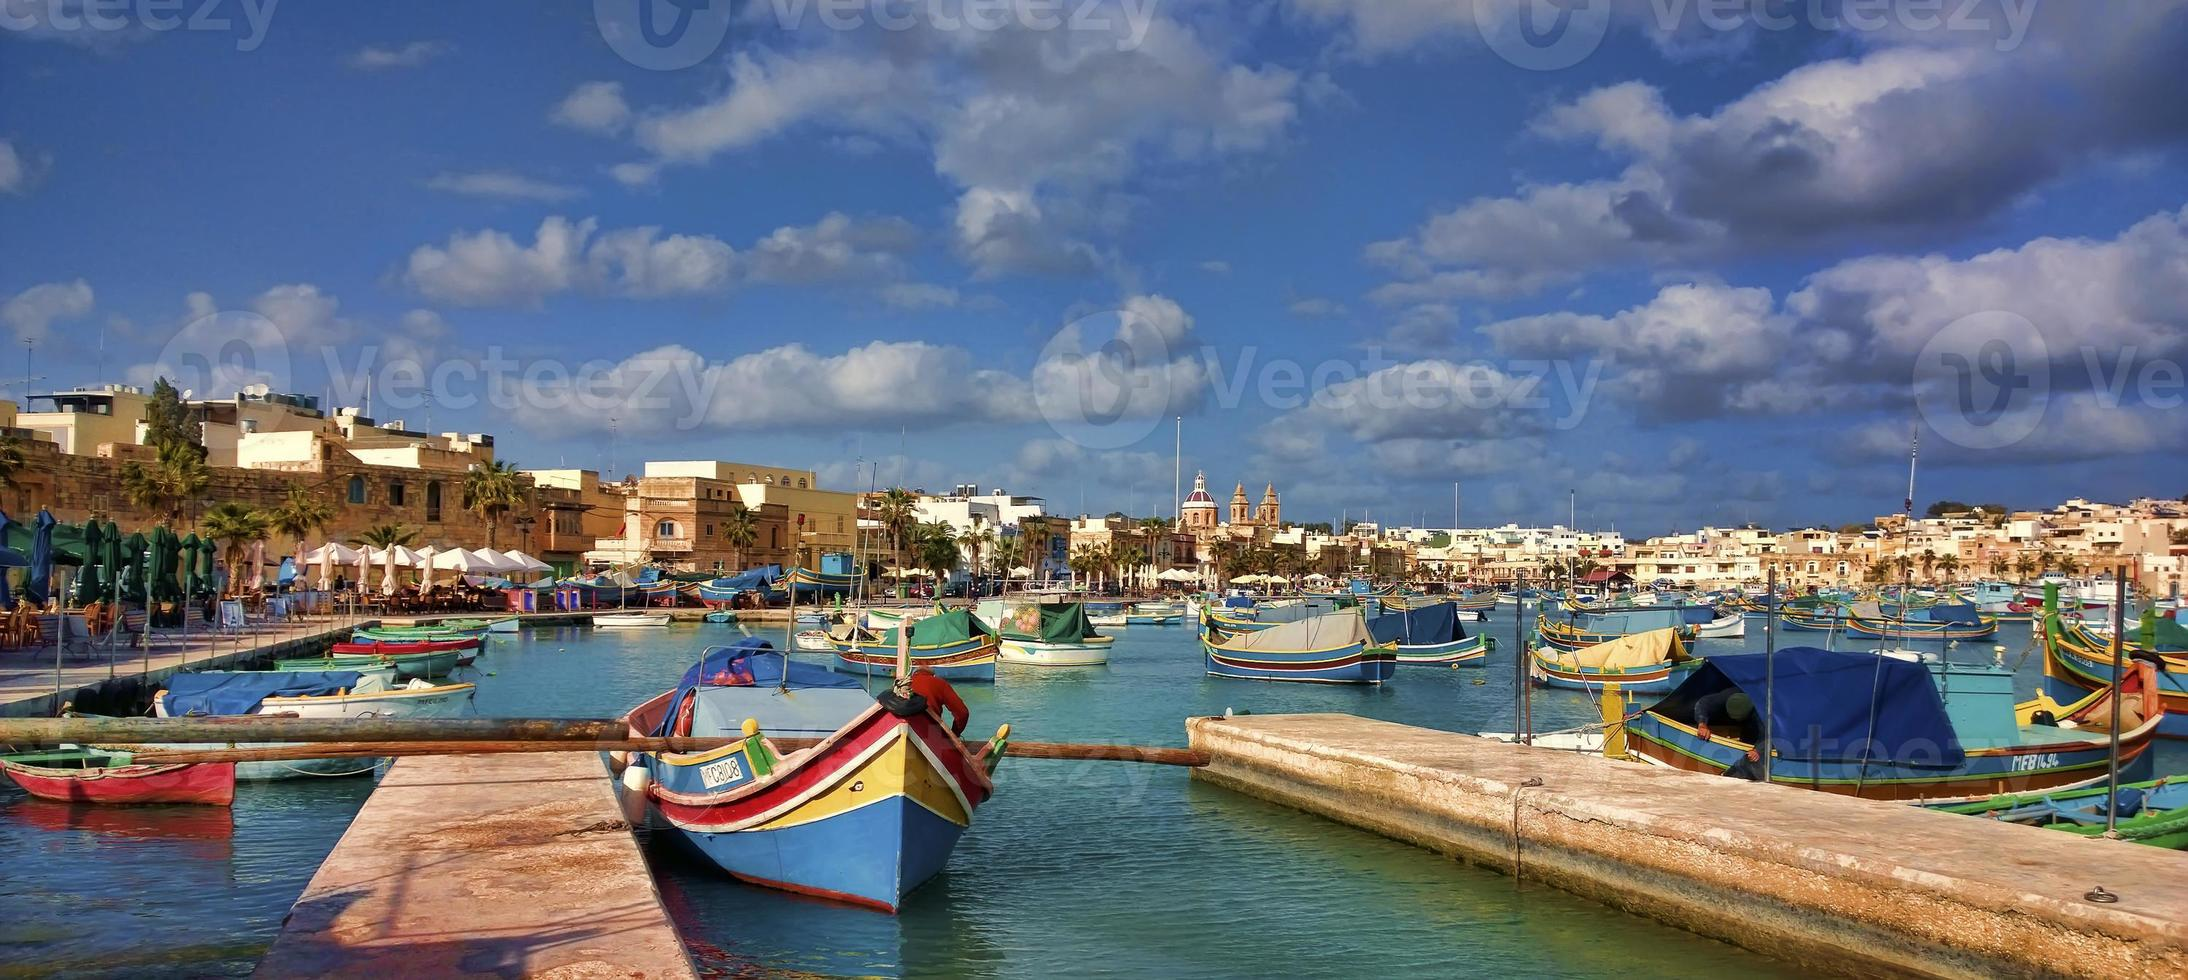 Marsaxlokk Hafen in Malta foto